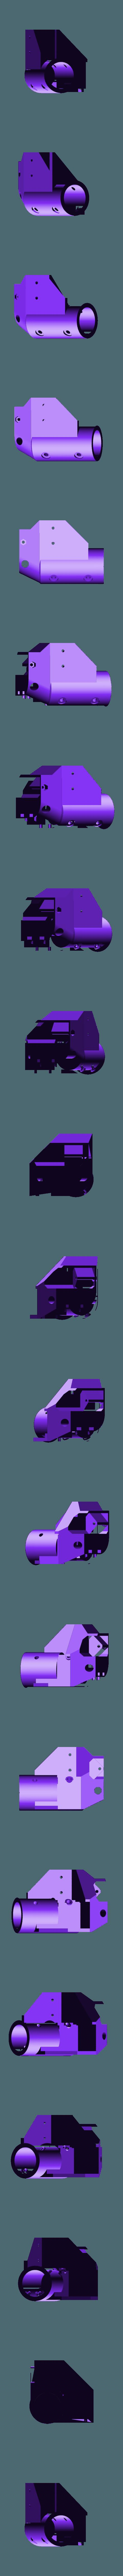 corner_back_right.stl Download free STL file FDM Printer de Kleine Reus 300x300x900 • 3D printable object, Job